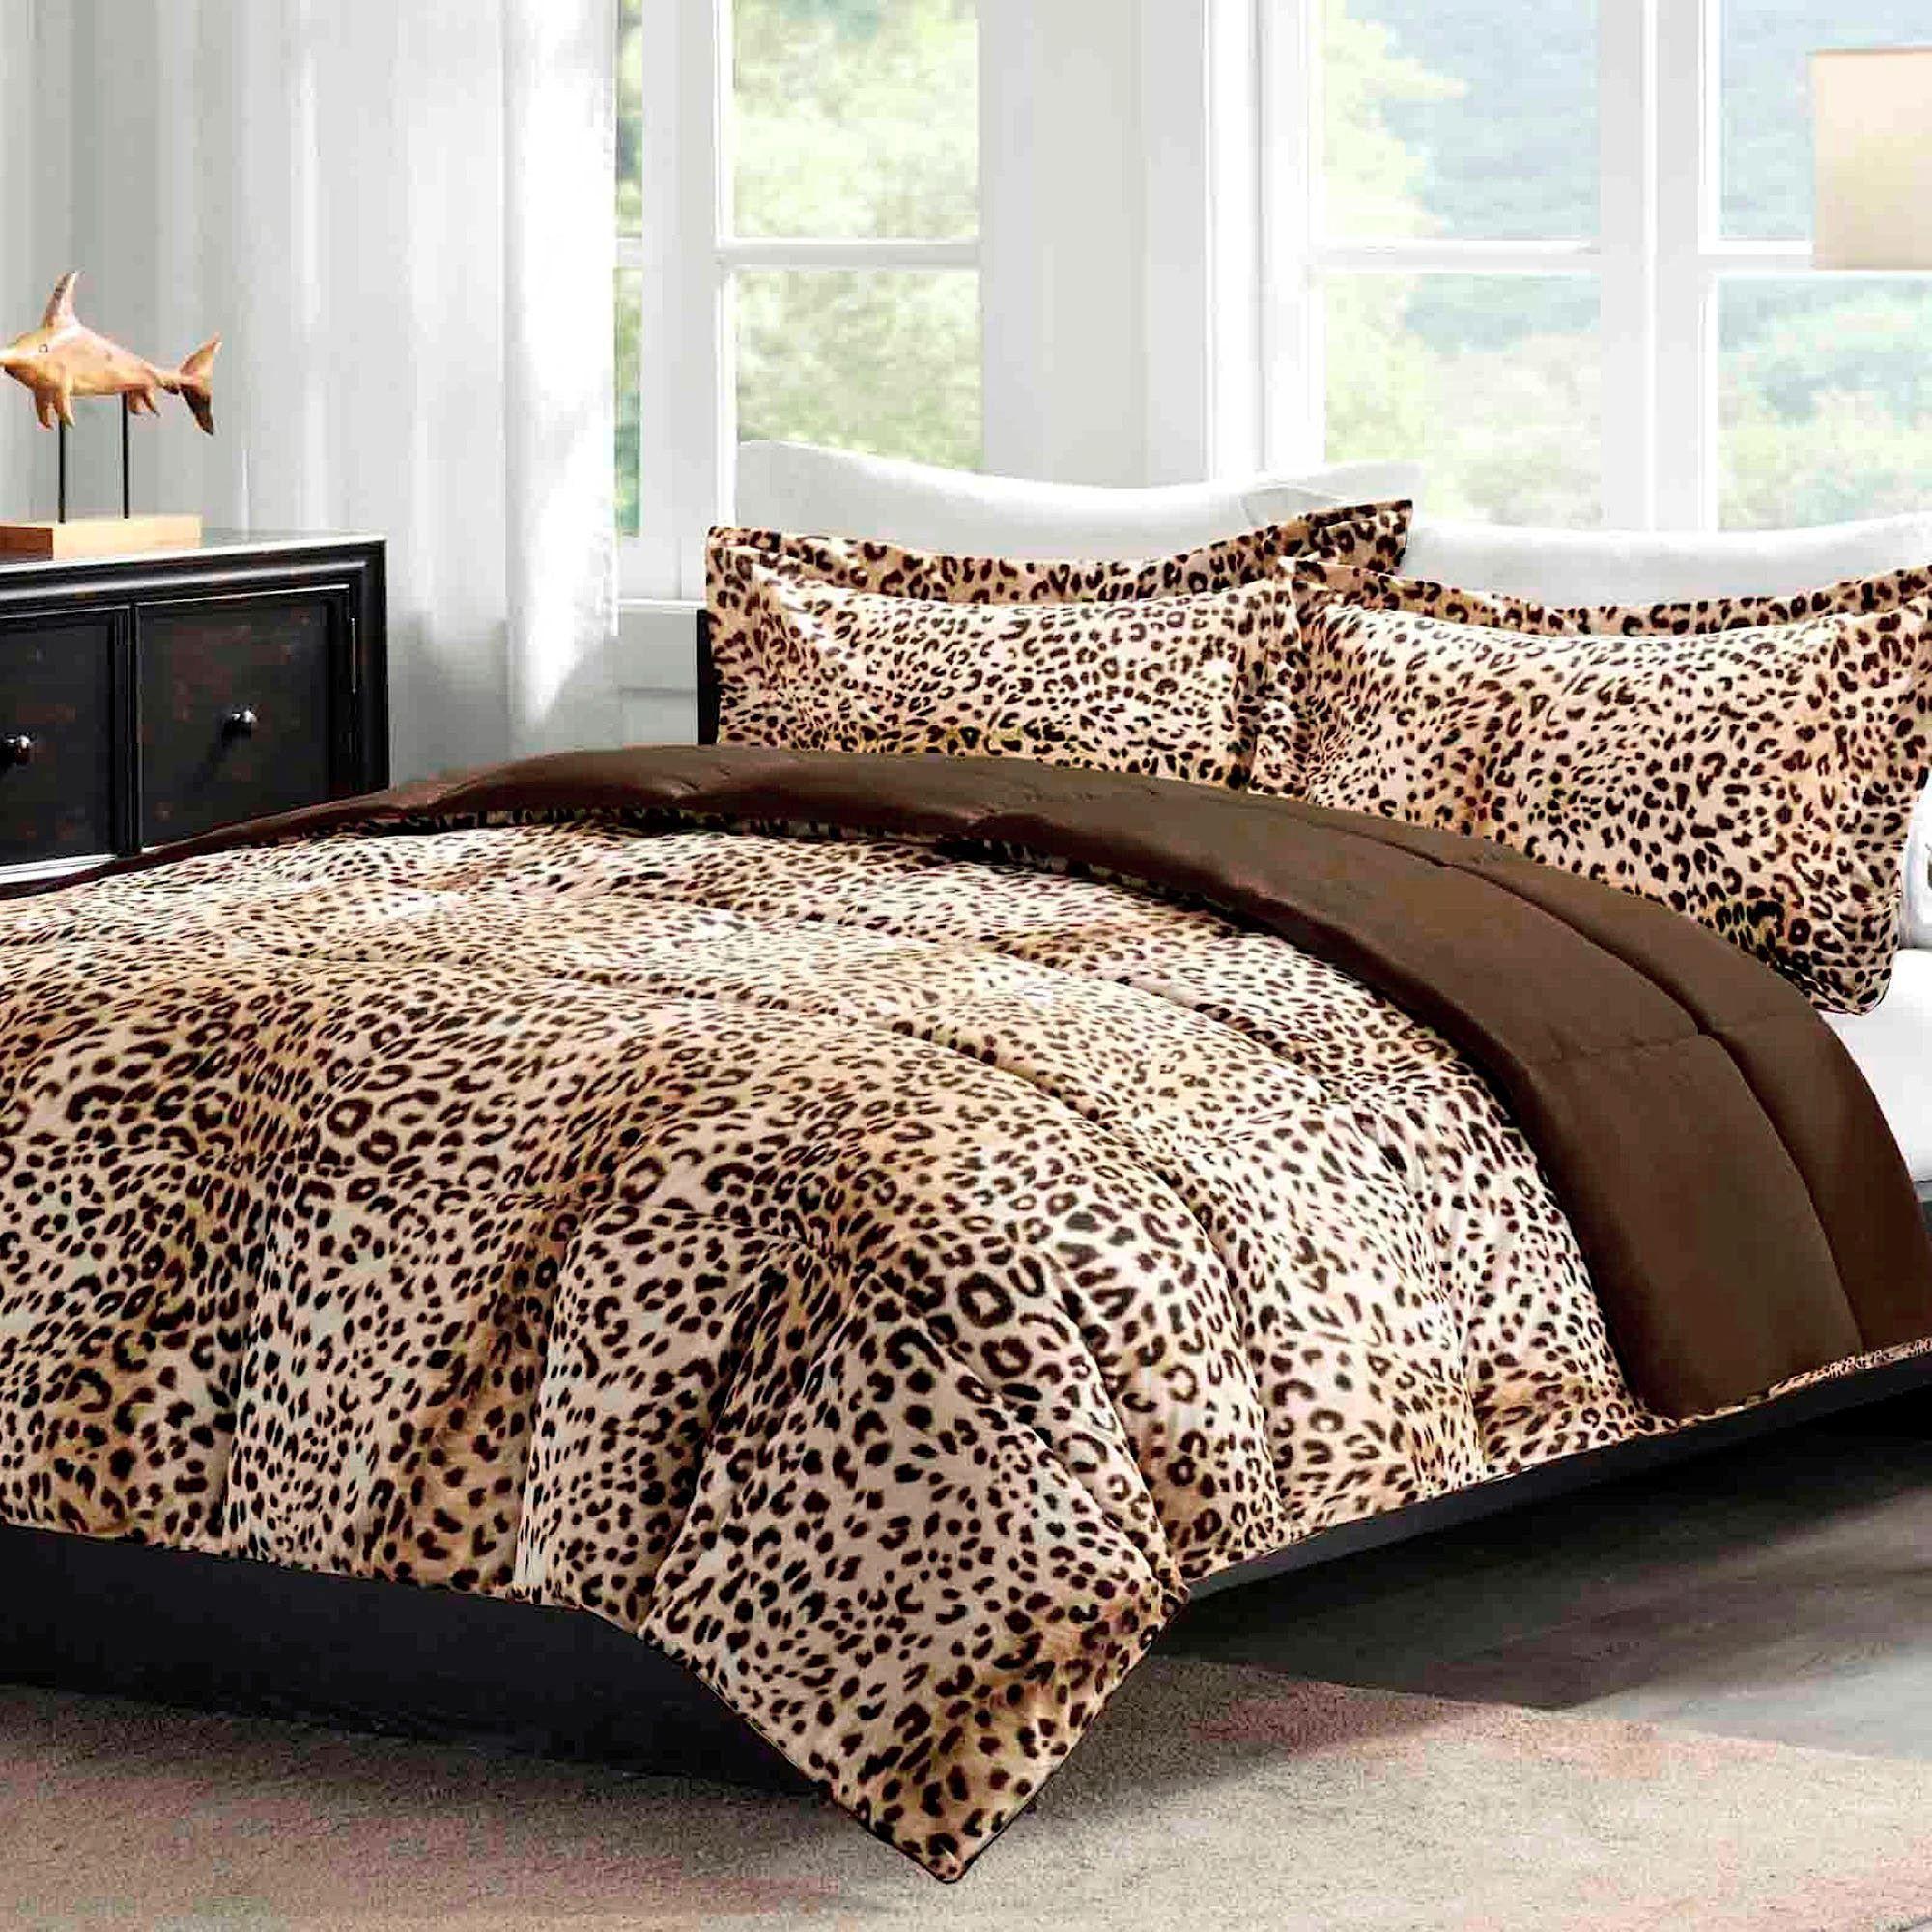 cheetah print bedroom theme photo - 9